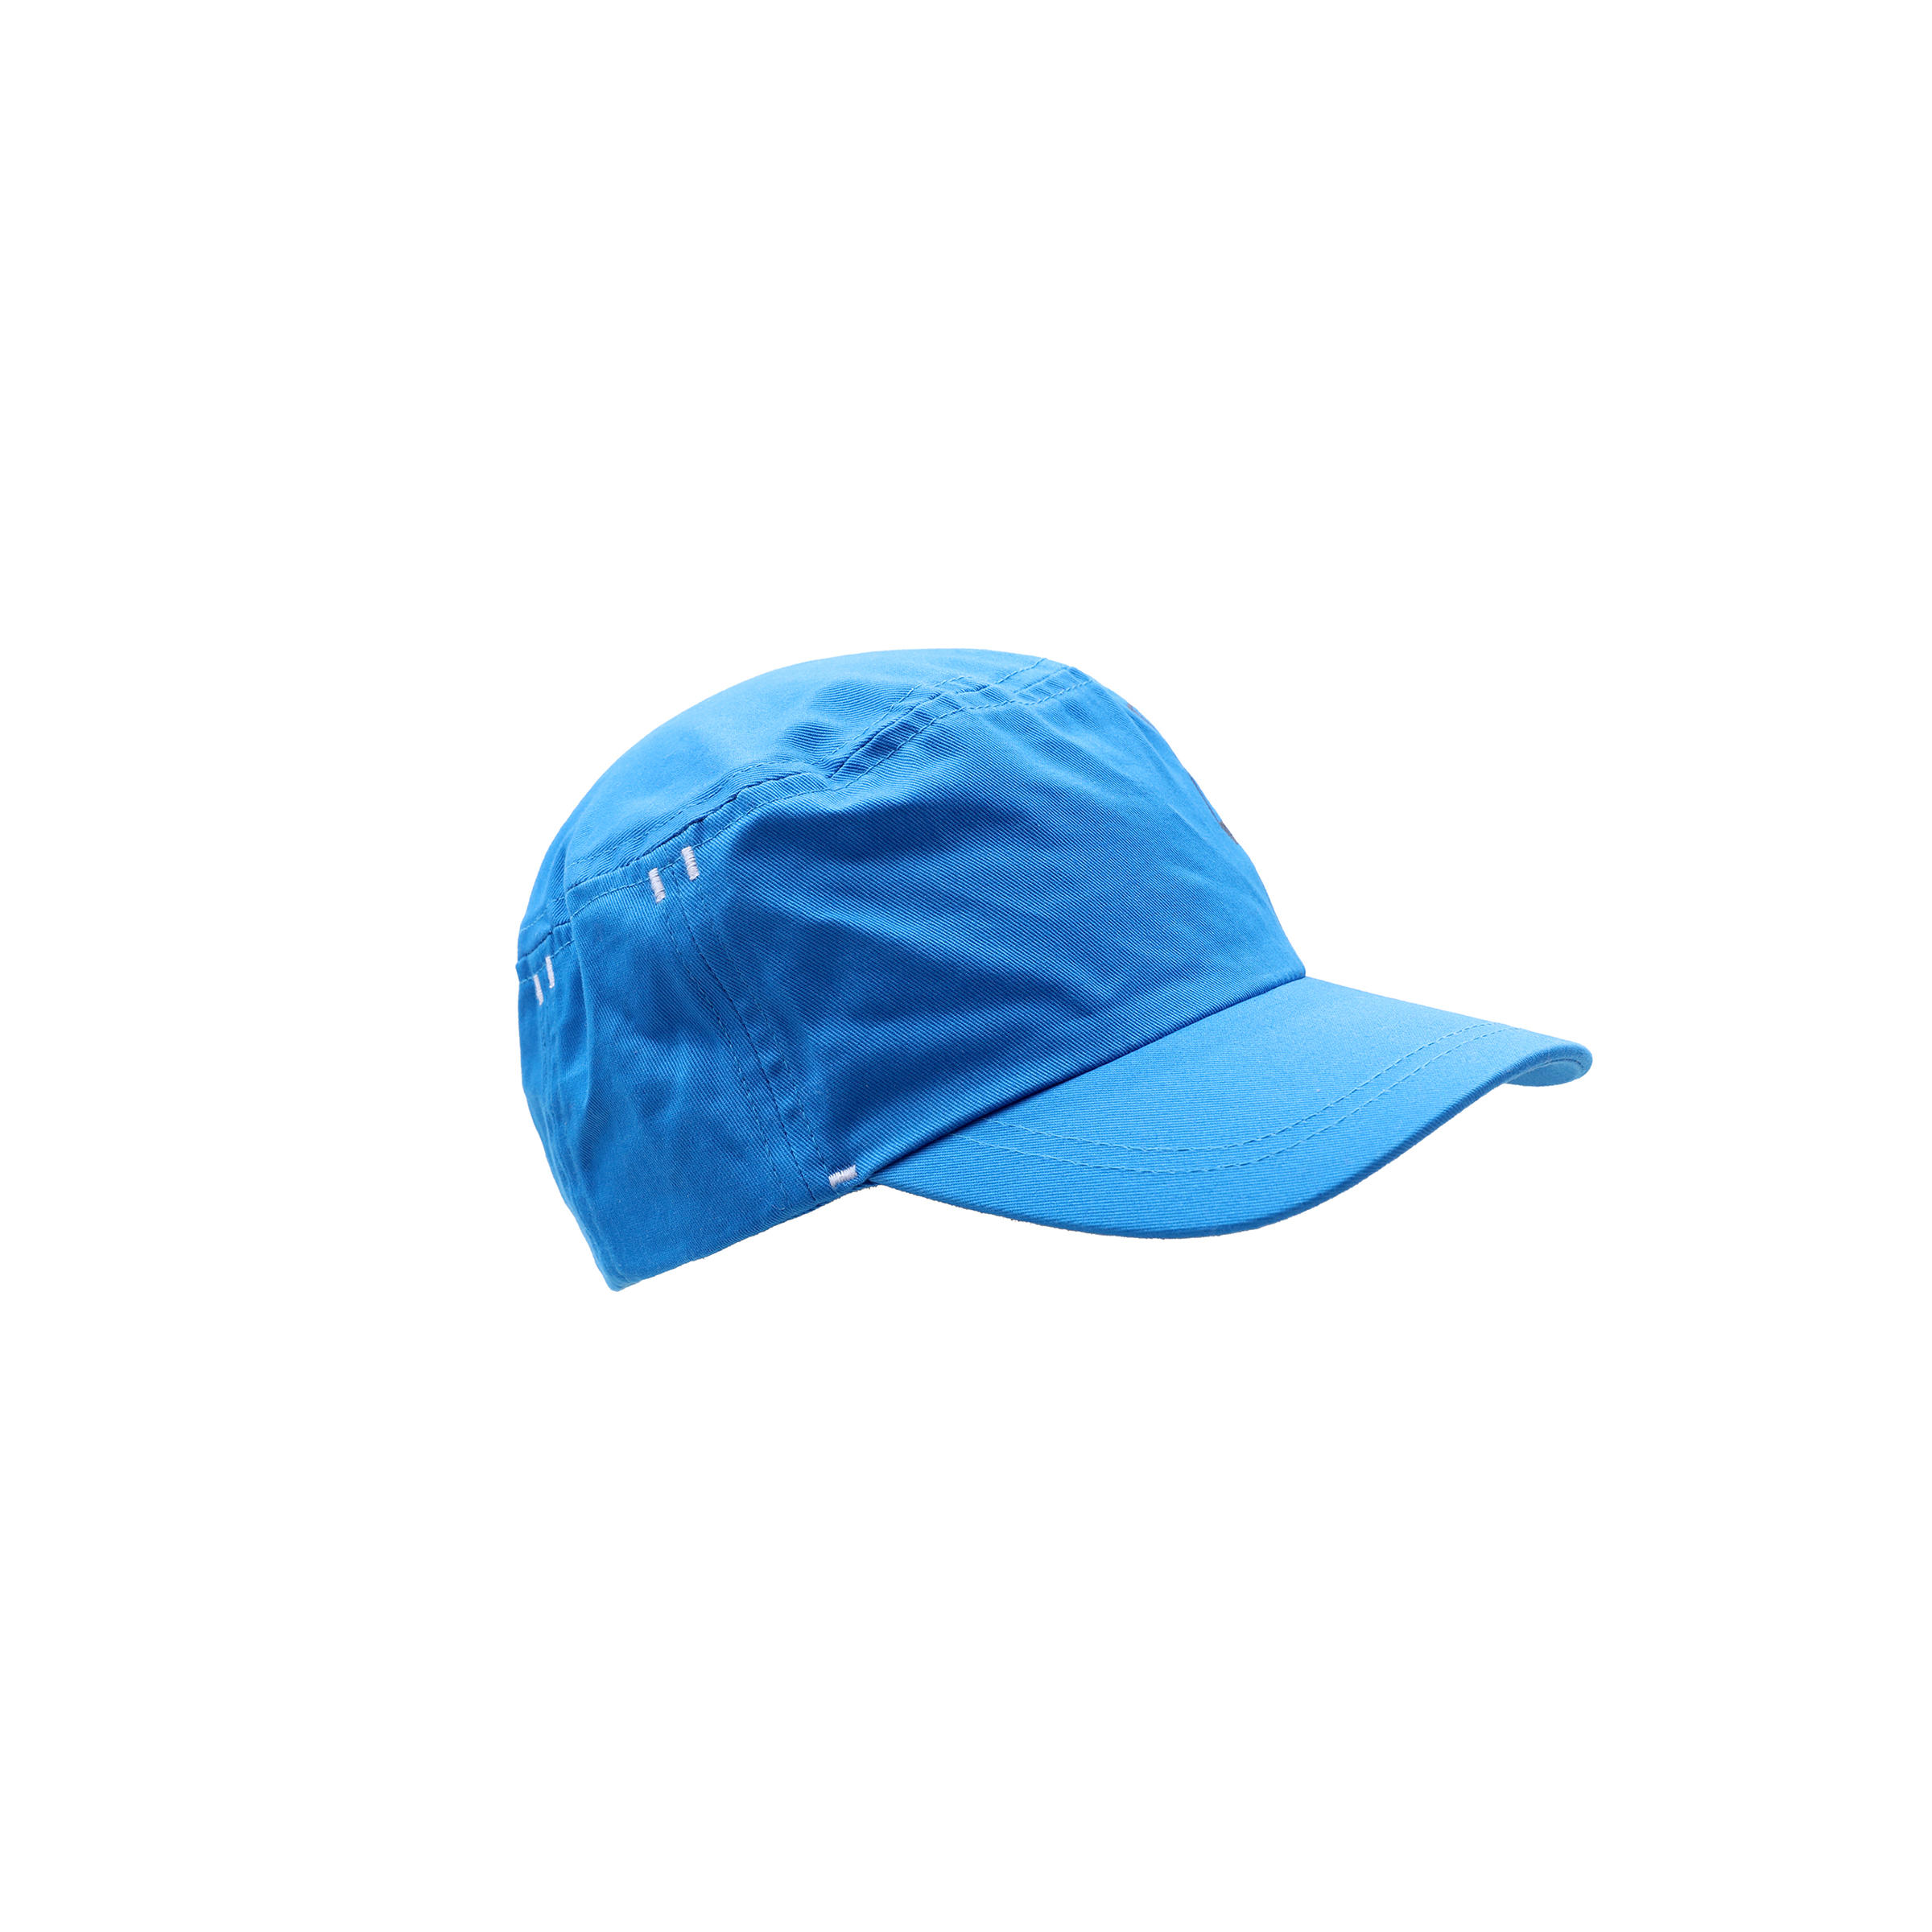 500 Baby Gym Cap - Blue Print